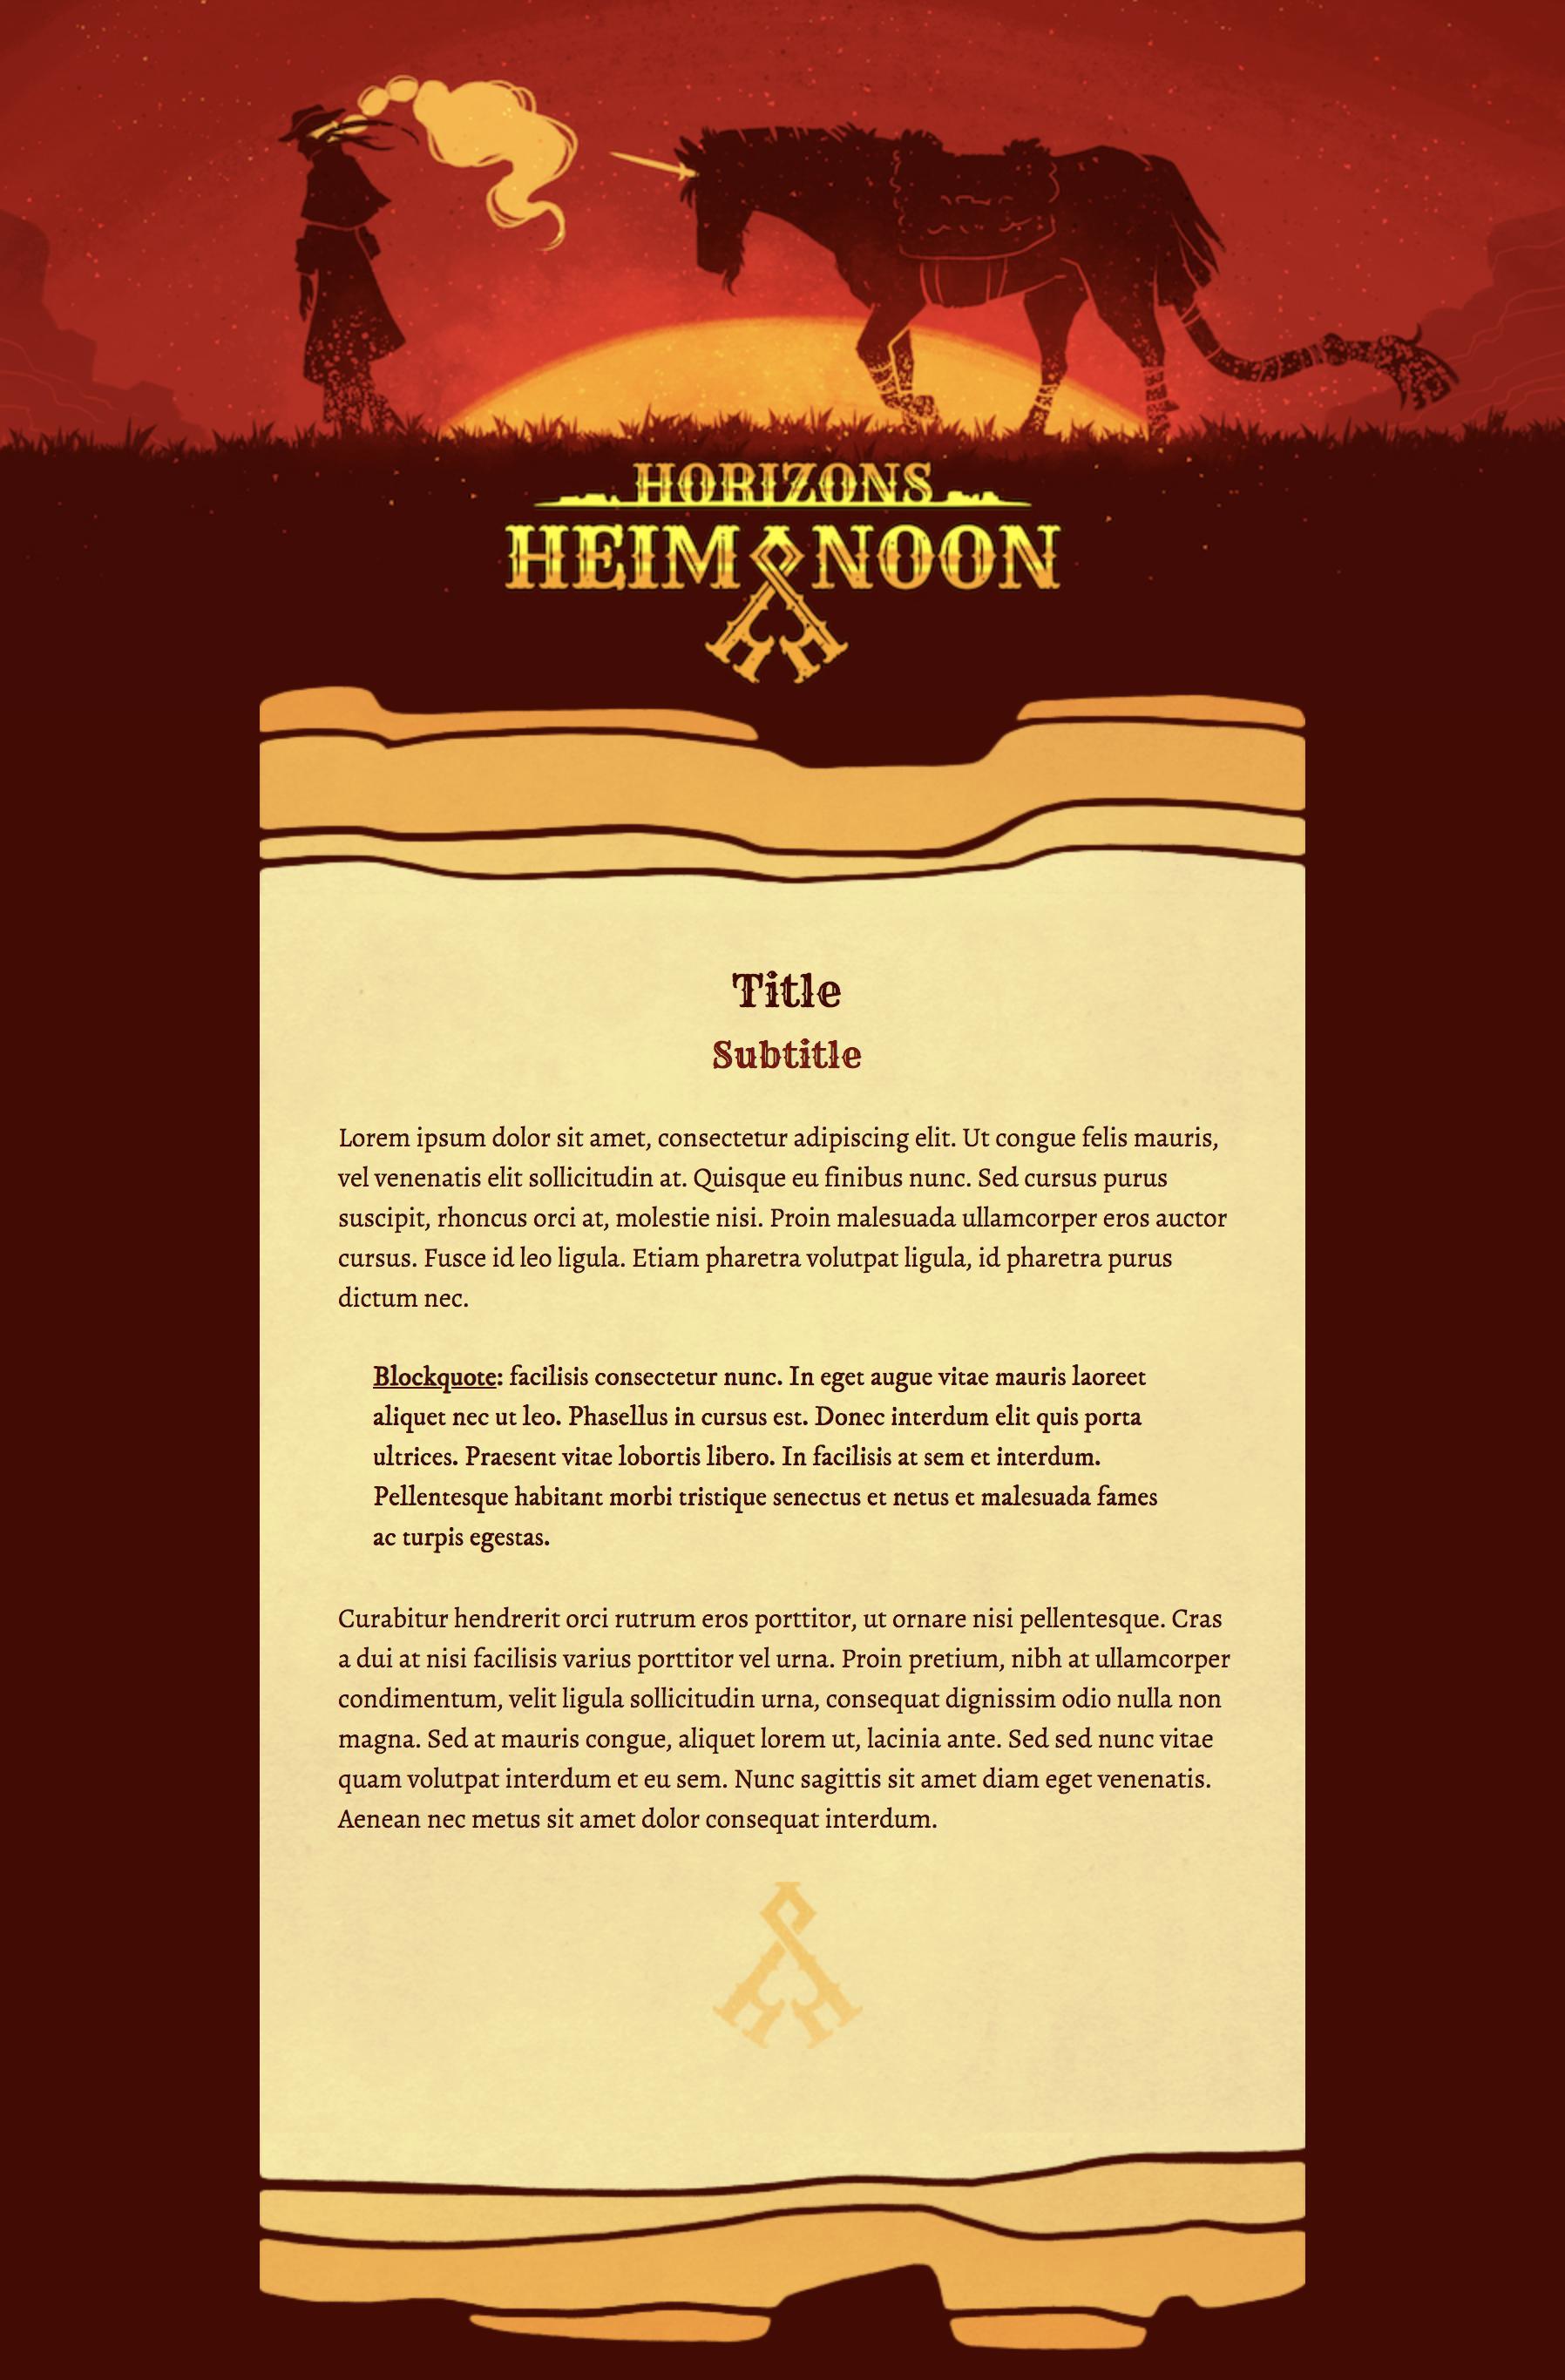 Heim Noon Horizons Literature CSS Skin